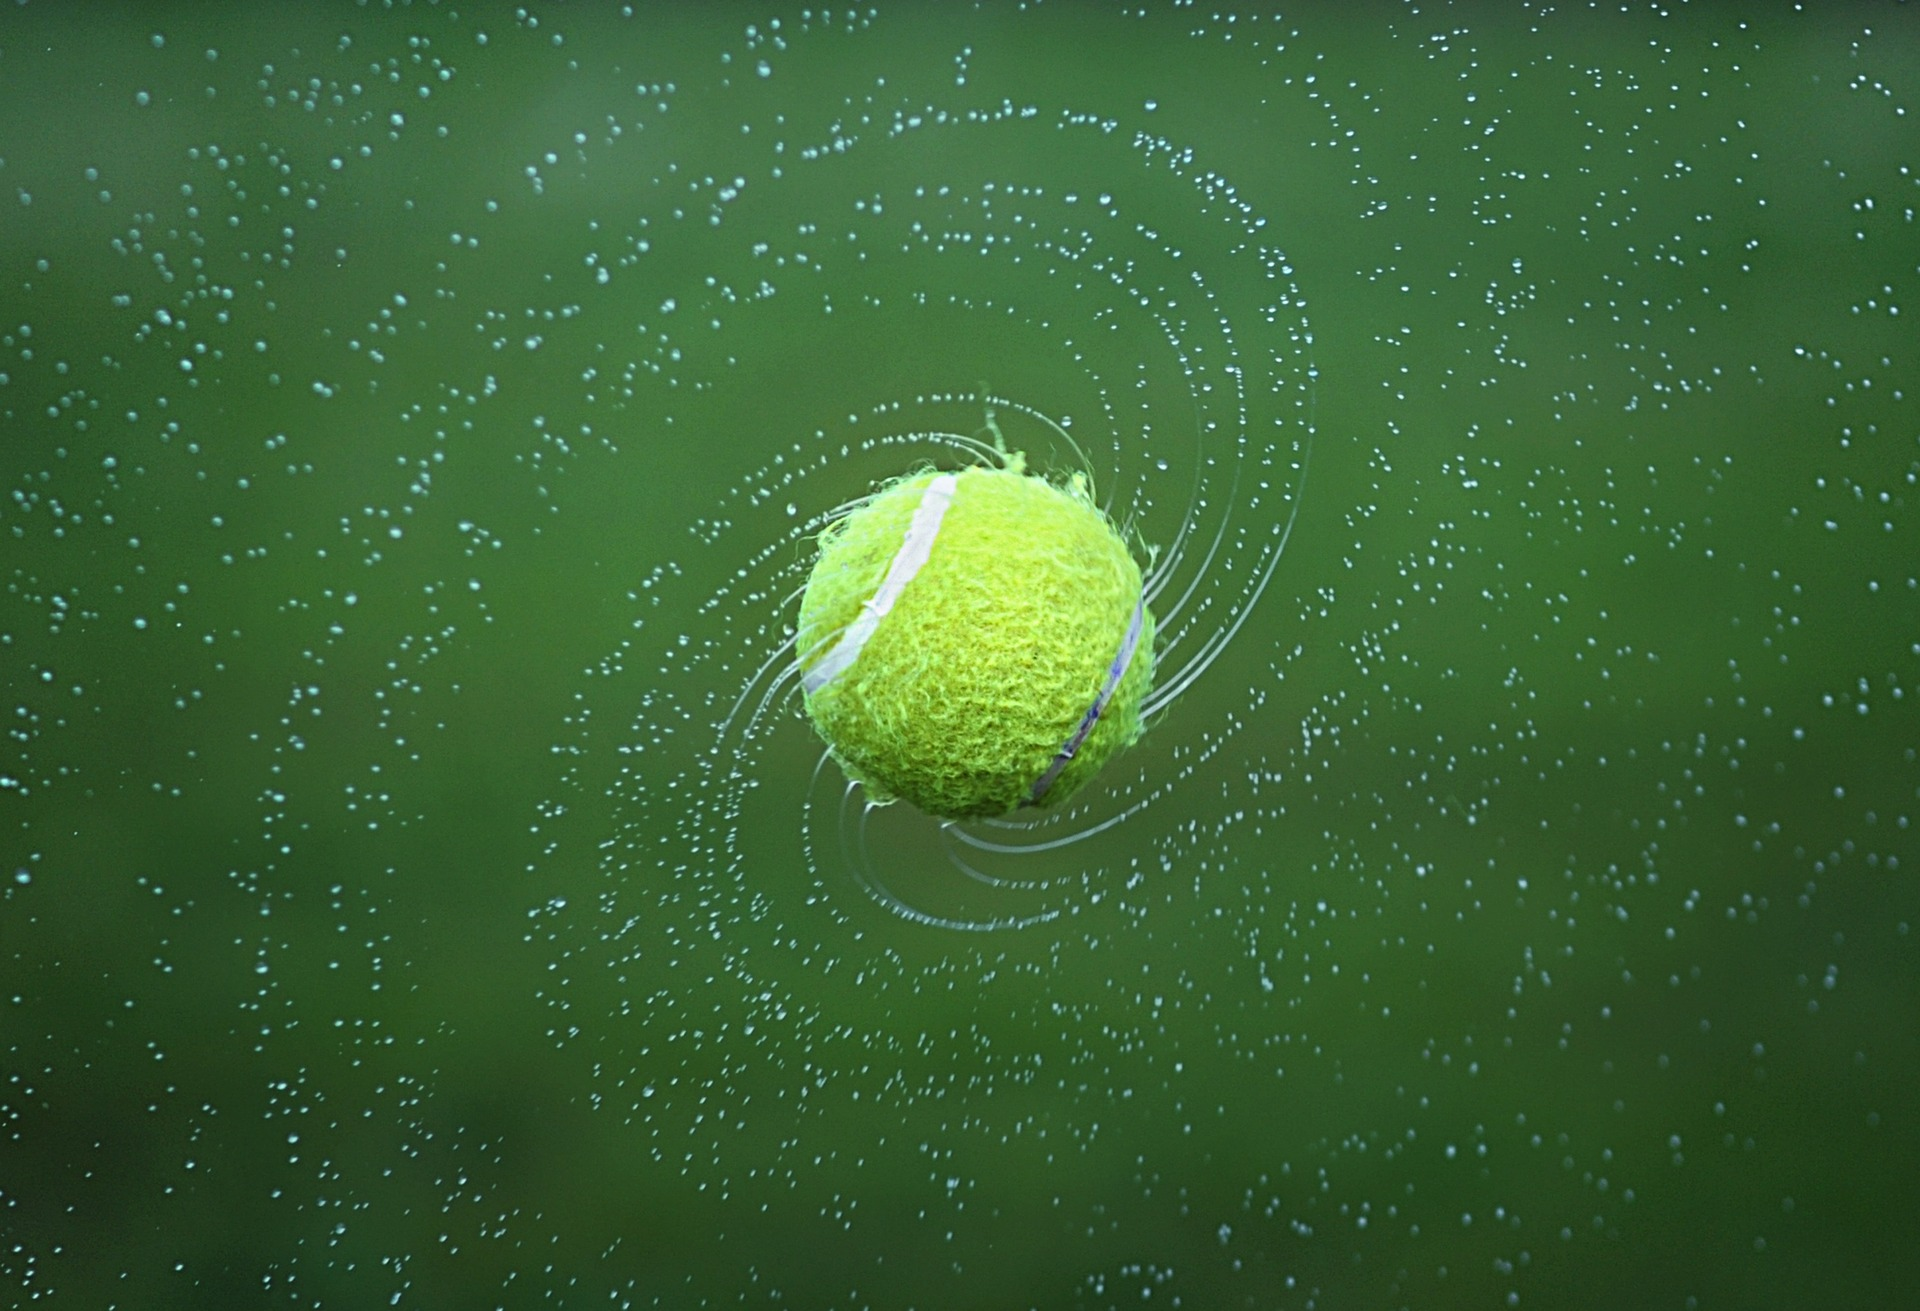 jp-linguistics-tennis-1381230_1920.jpg